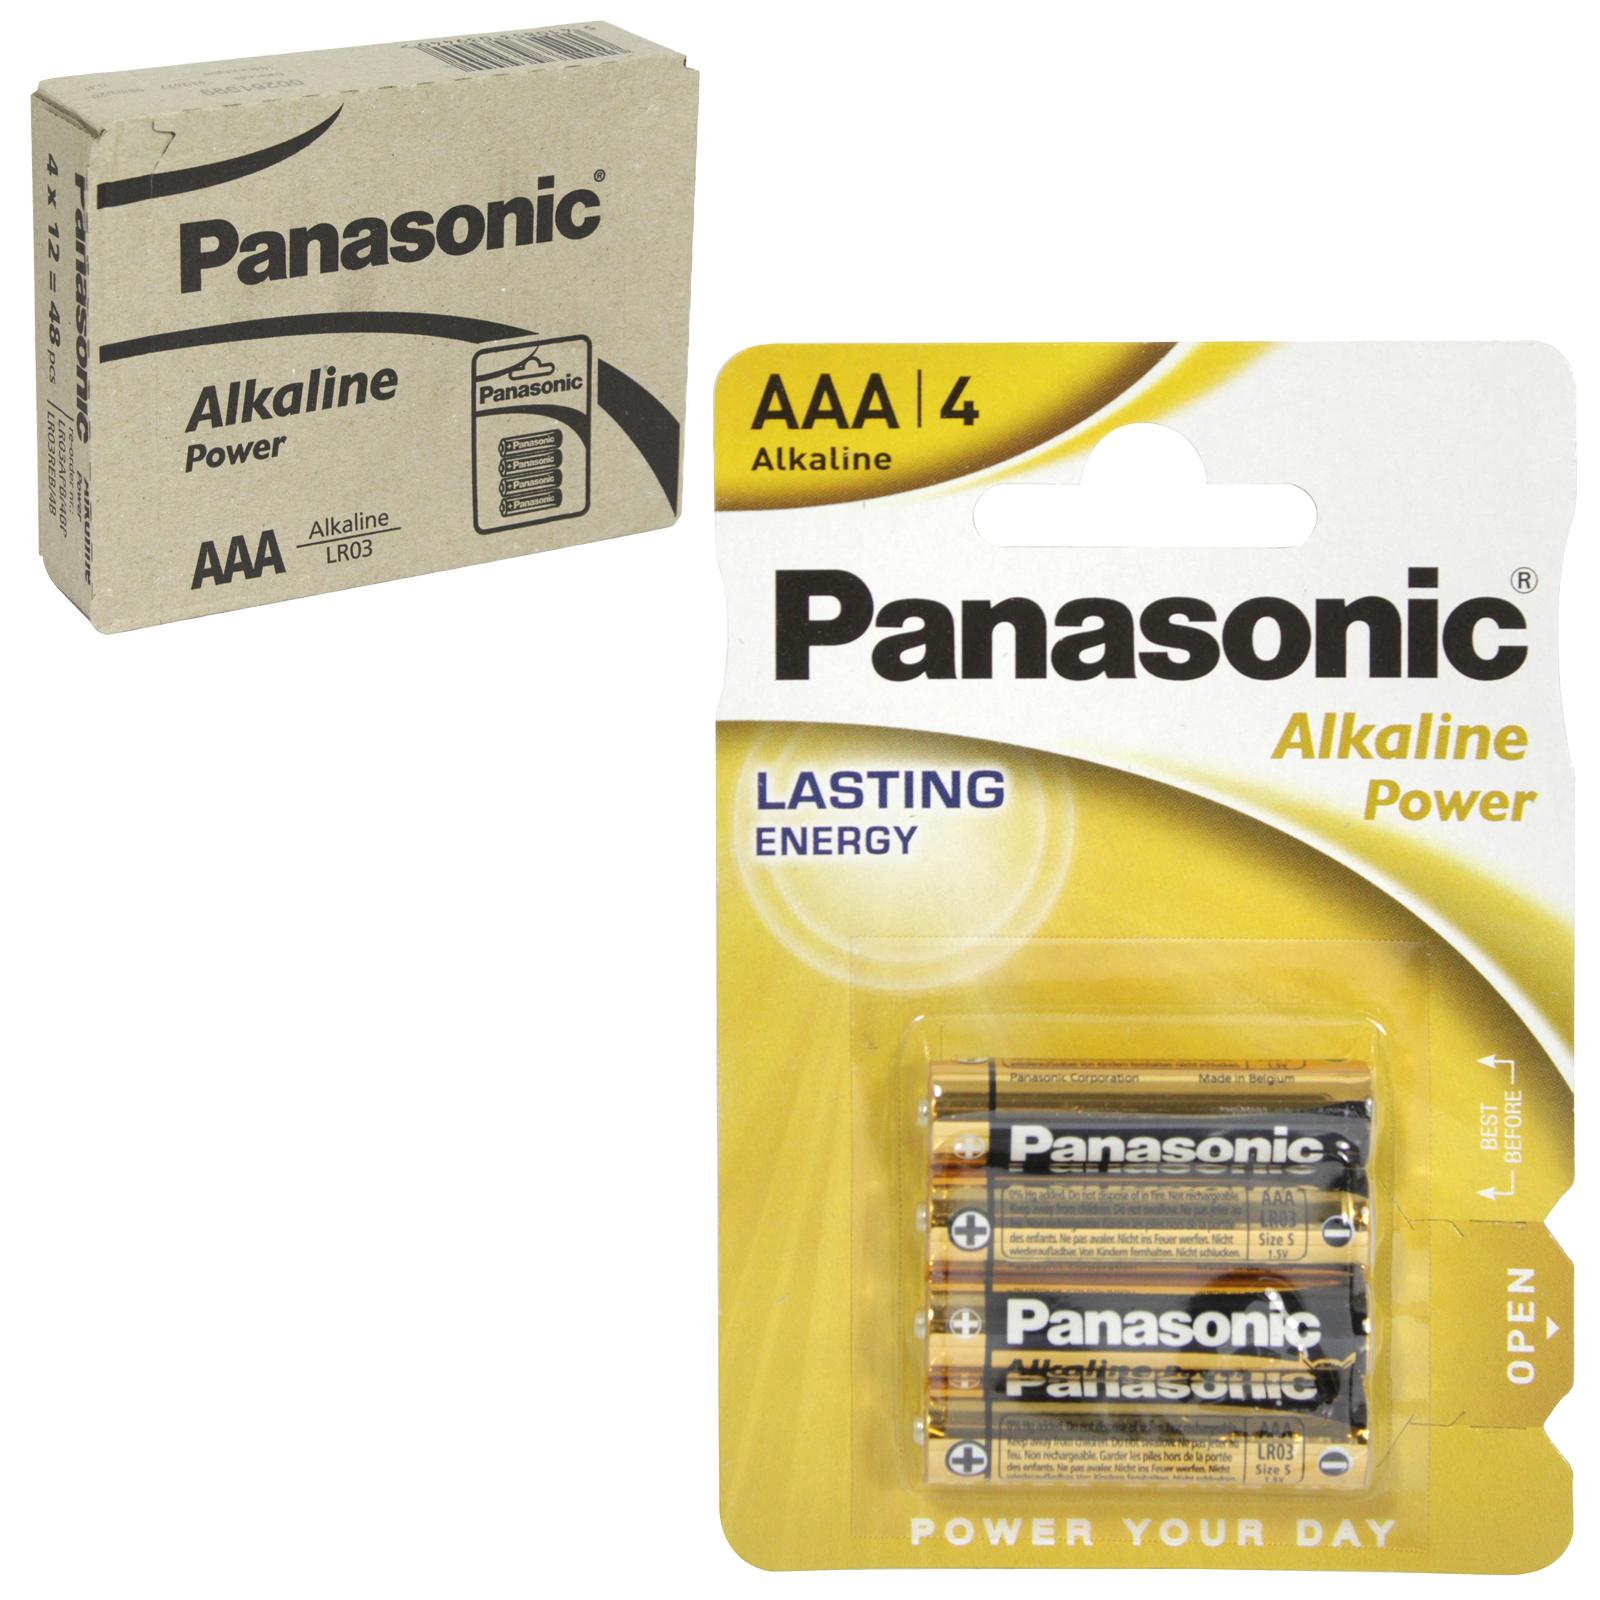 PANASONIC BATTERIES ALKALINE POWER LR03 4PKAAA X12